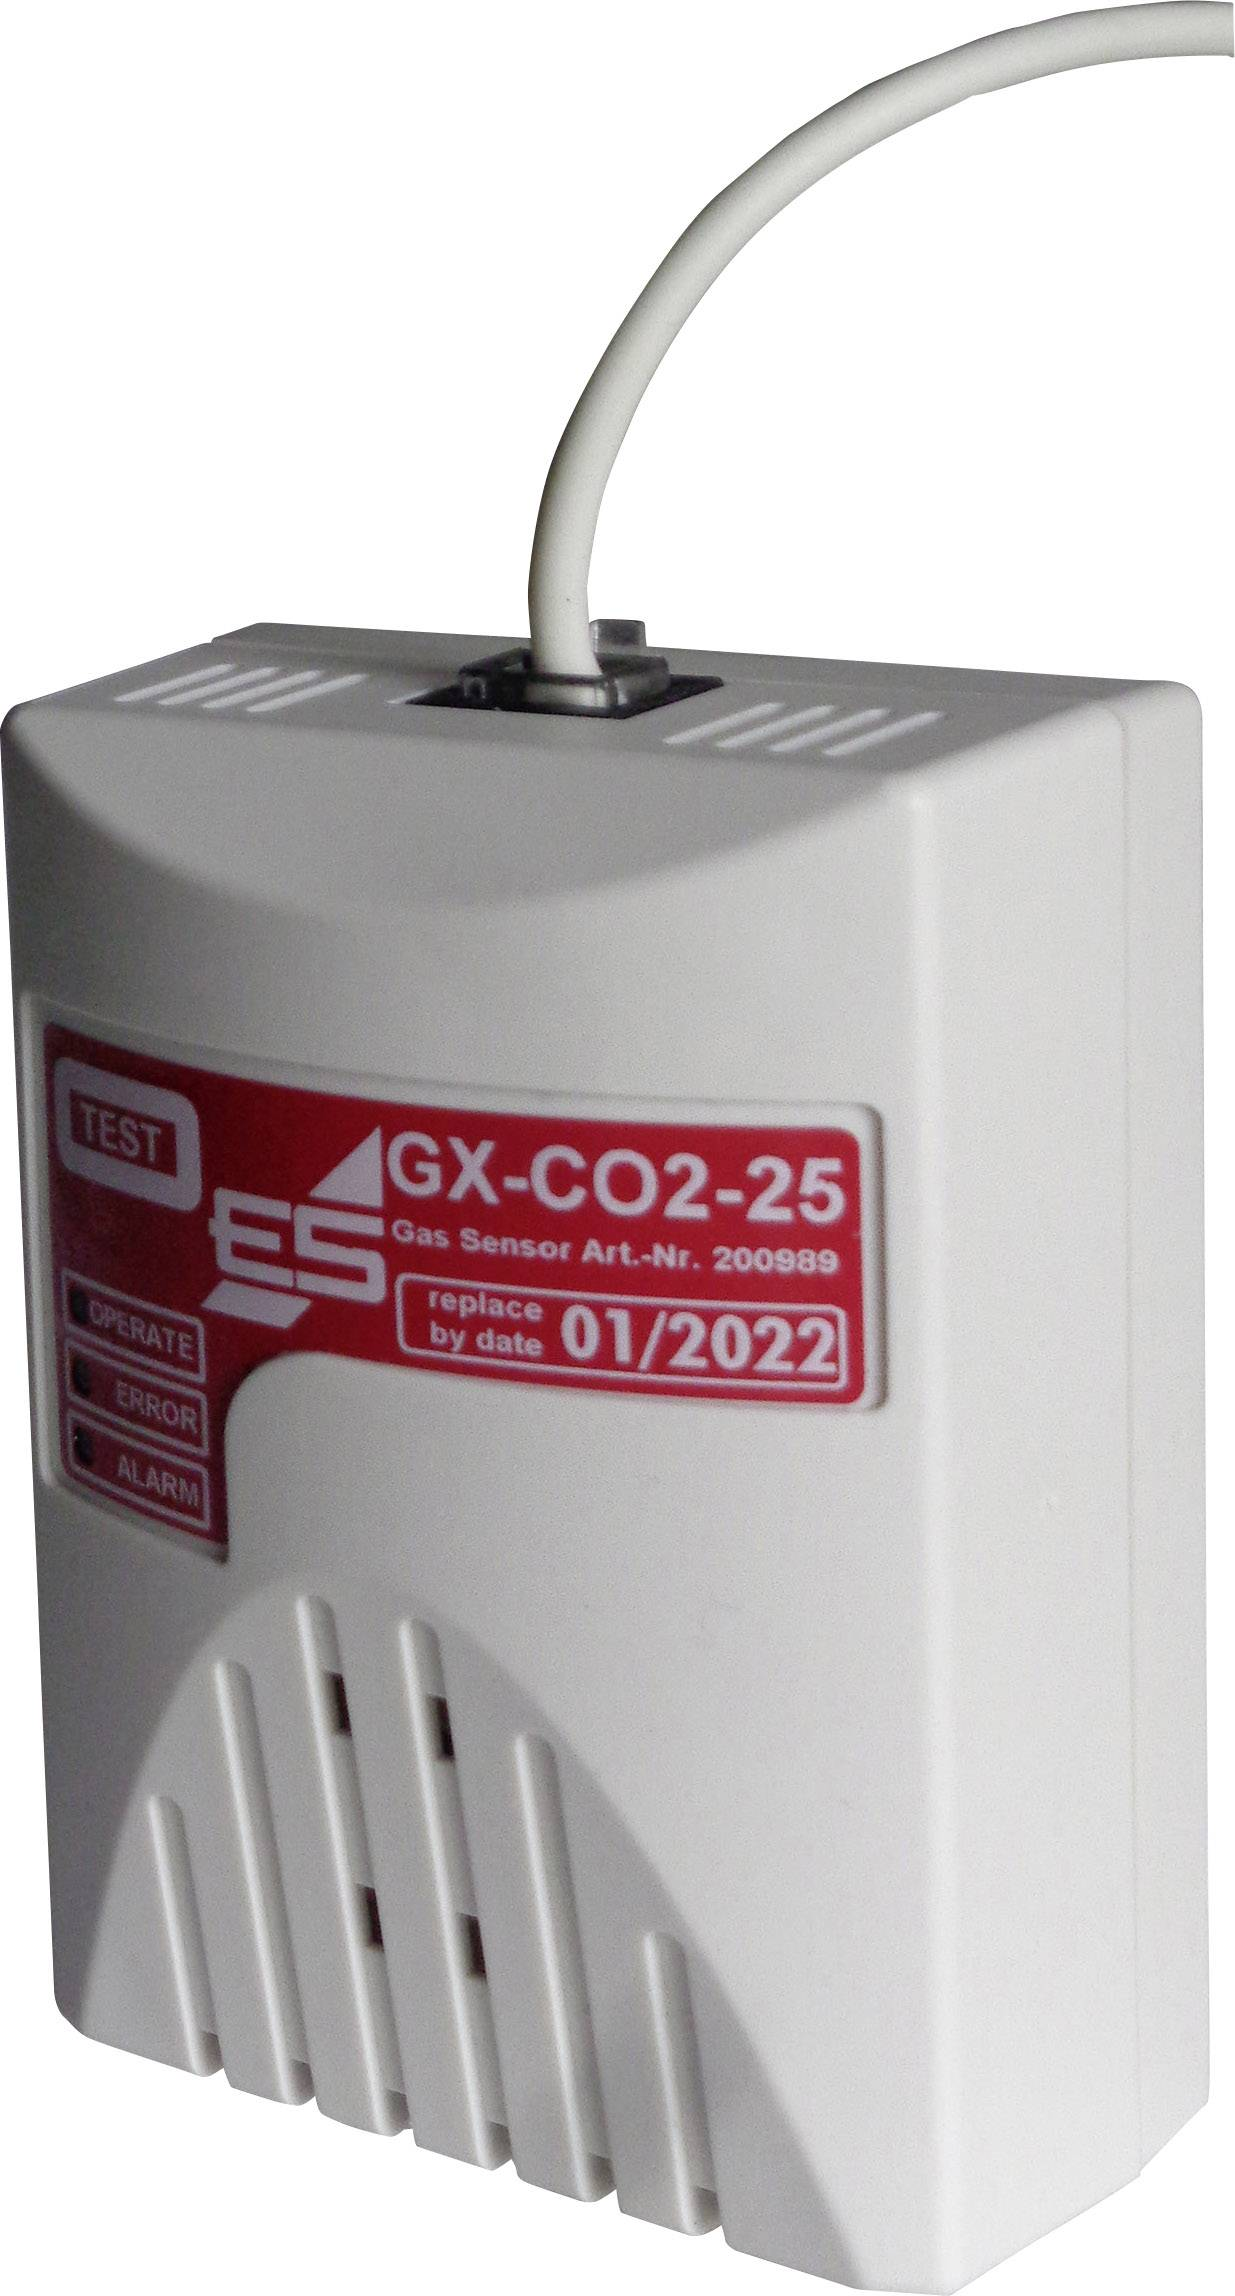 Senzor úniku plynu Schabus GX-CO2, 200989-C2, 5 V